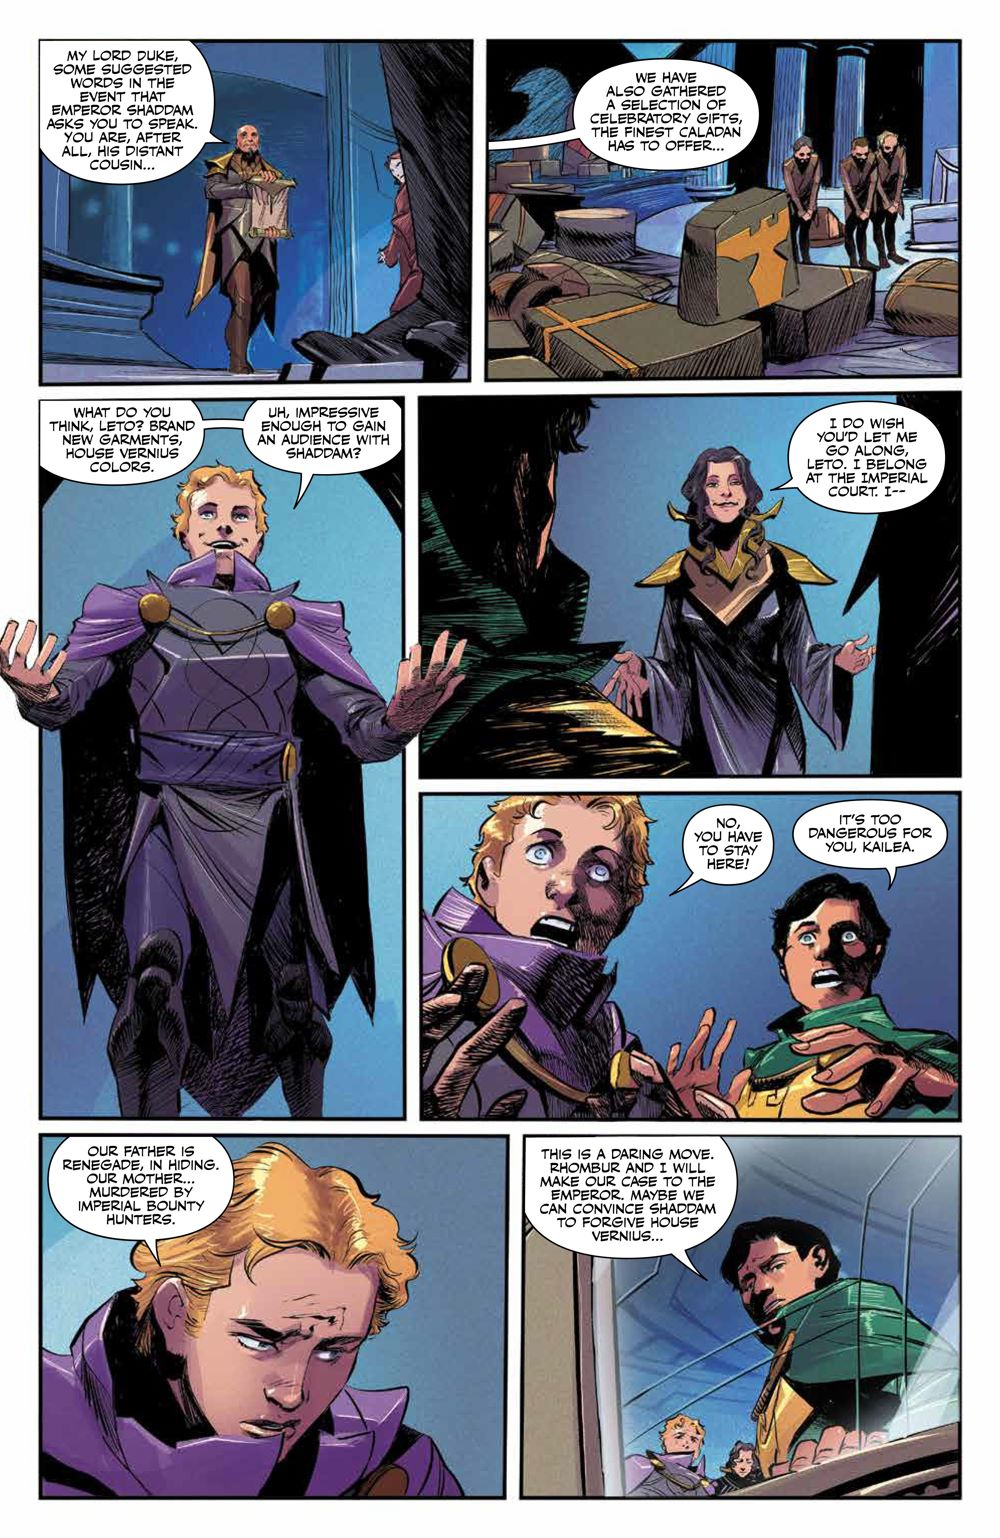 Dune_HouseAtreides_010_PRESS_4 ComicList Previews: DUNE HOUSE ATREIDES #10 (OF 12)